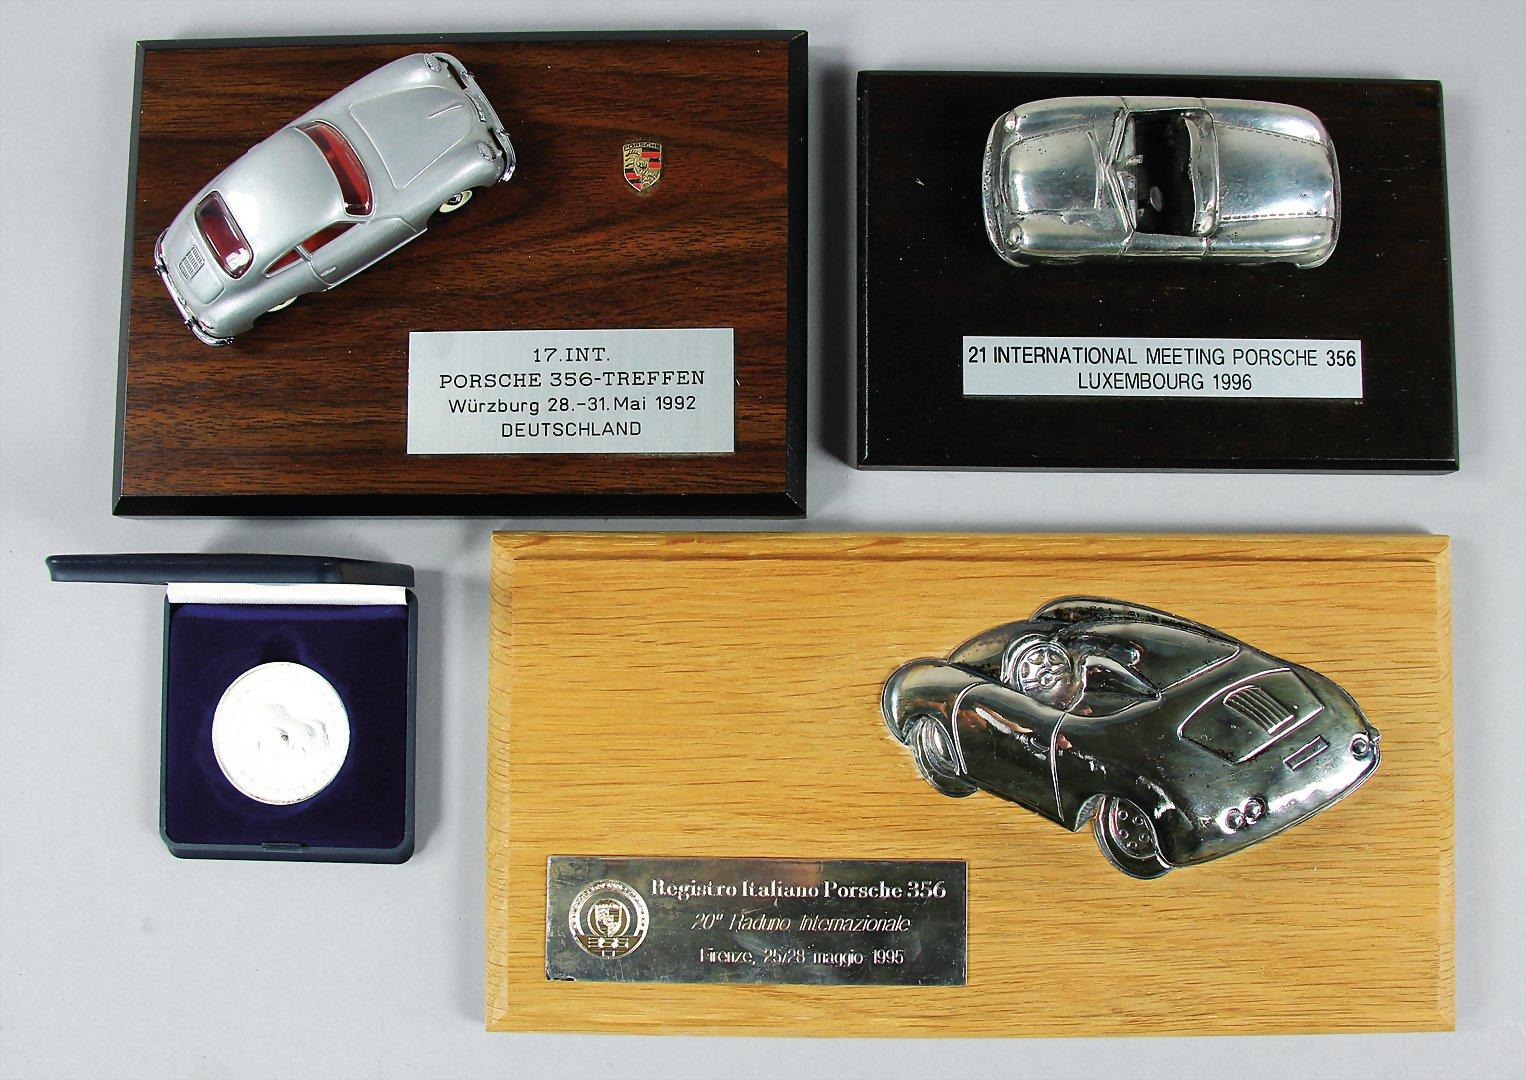 PORSCHE 100th ANNIVERSARY FERRY PORSCHE BIRTH 356 911 GRILL BADGE GIFT BOXED